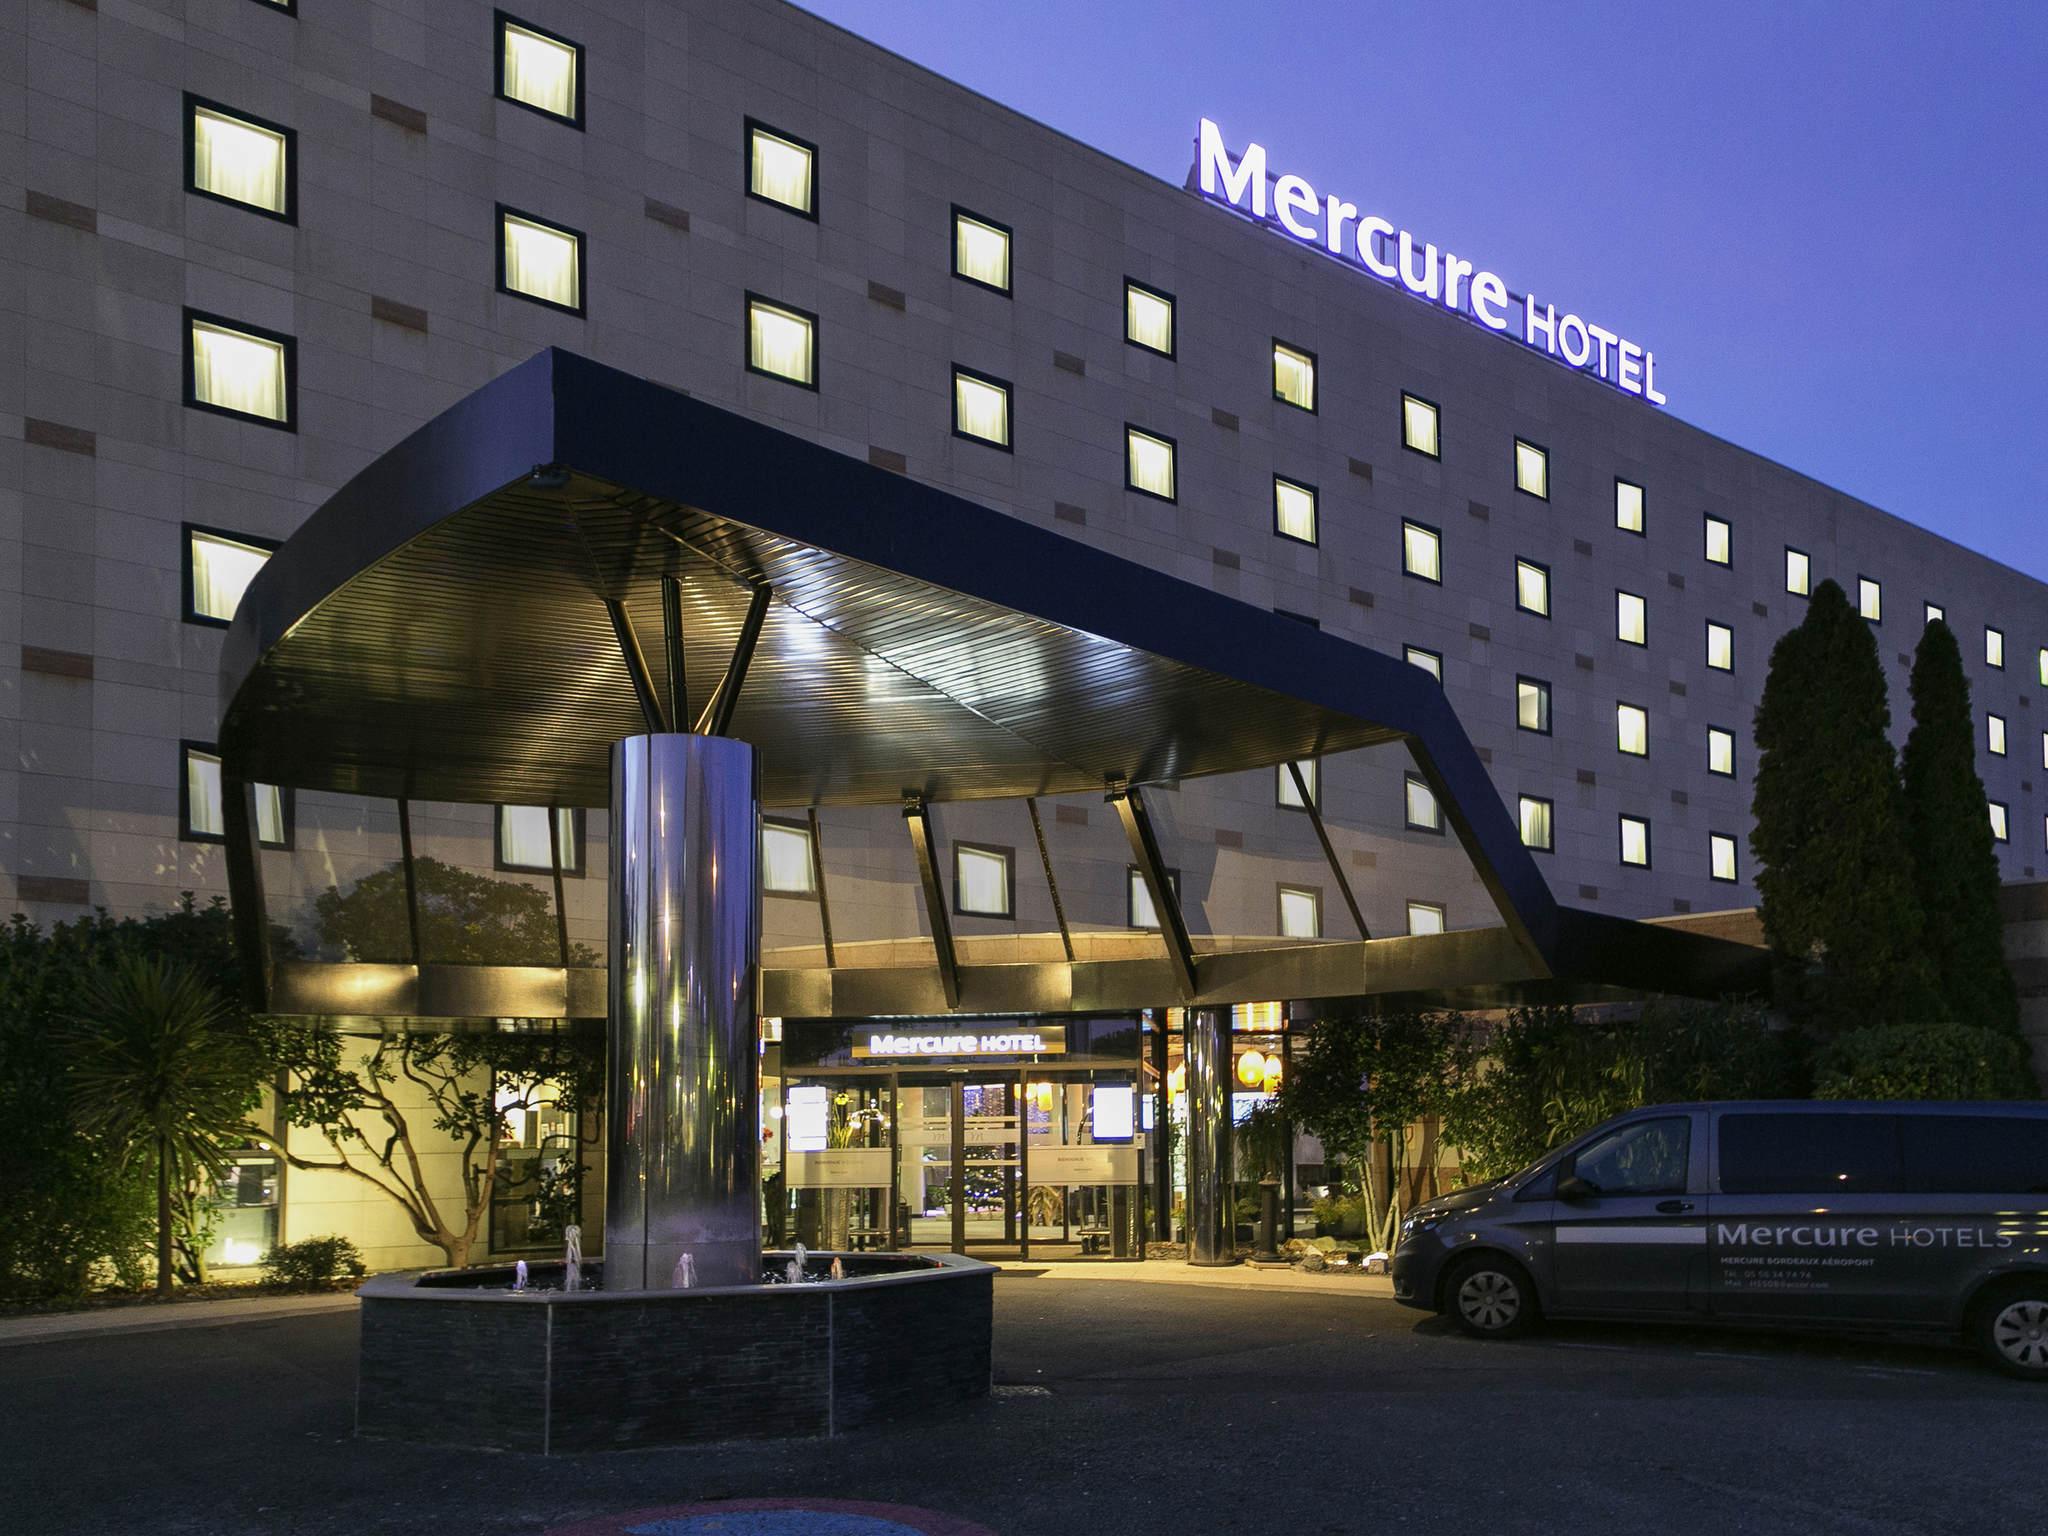 interiors merignac hotel mercure bordeaux airport hotel